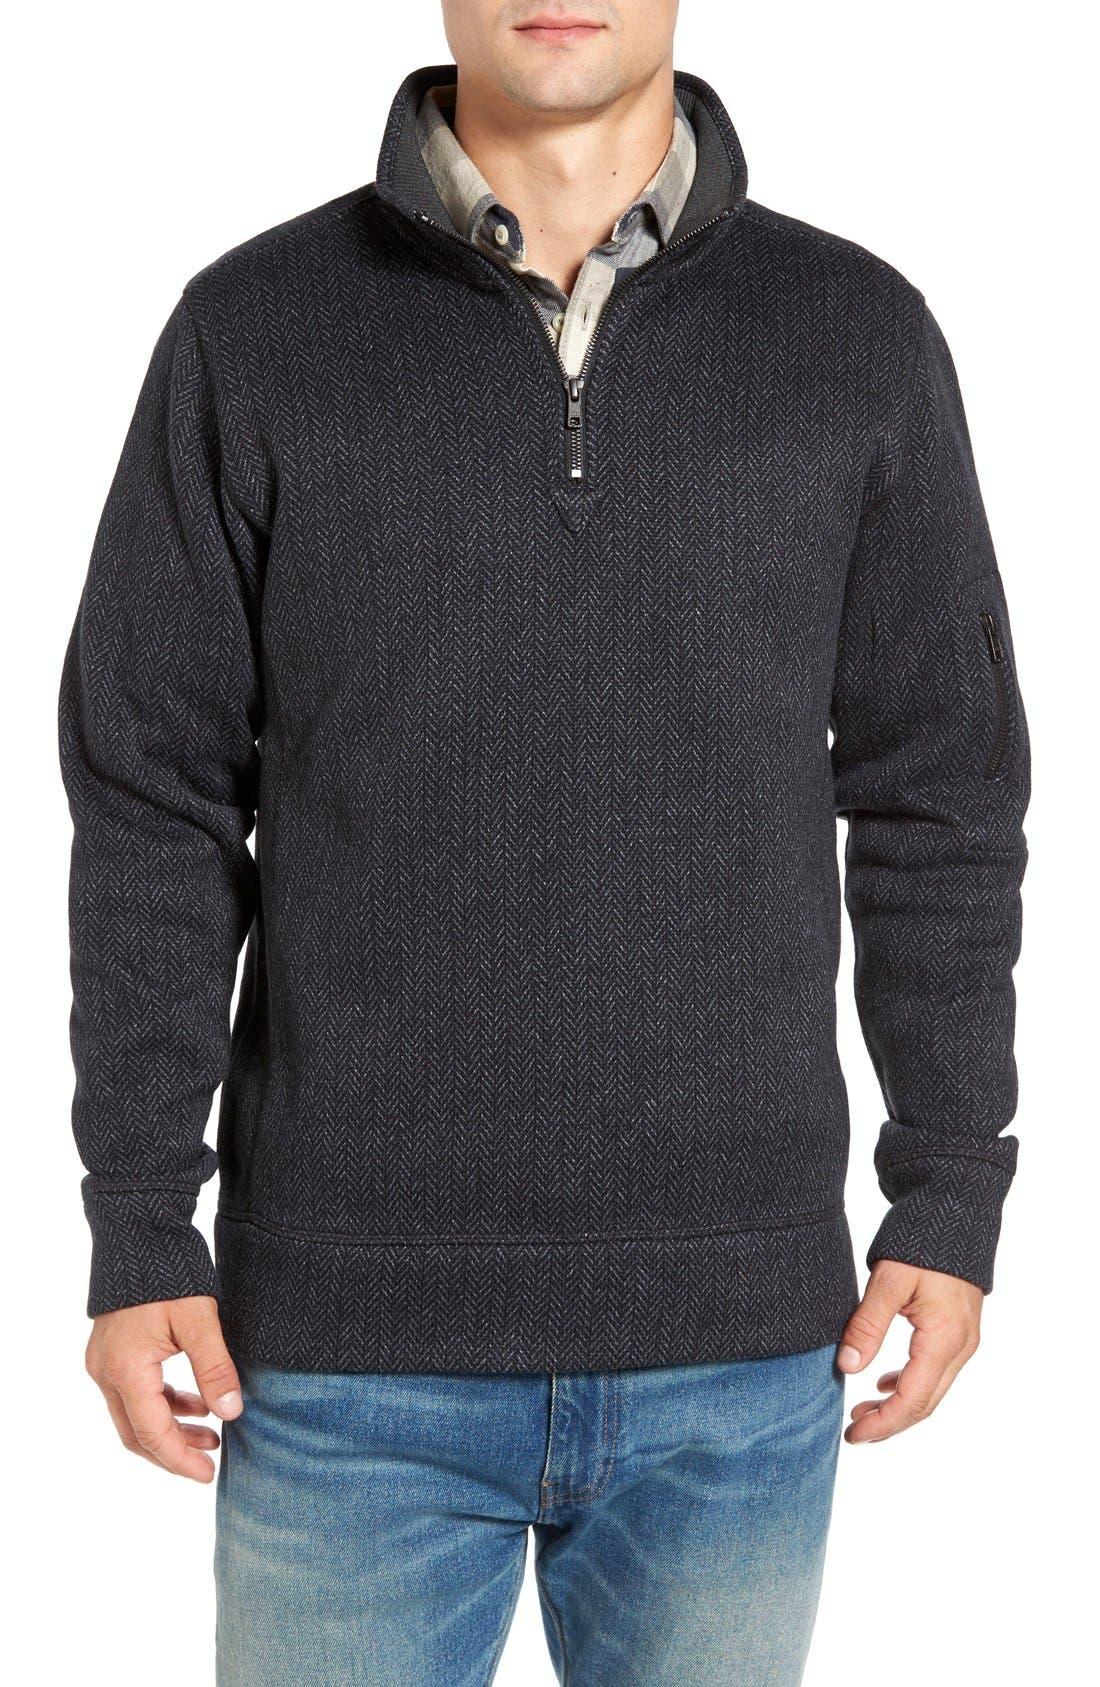 Alternate Image 1 Selected - Jeremiah Lance Herringbone Zip Mock Neck Sweater